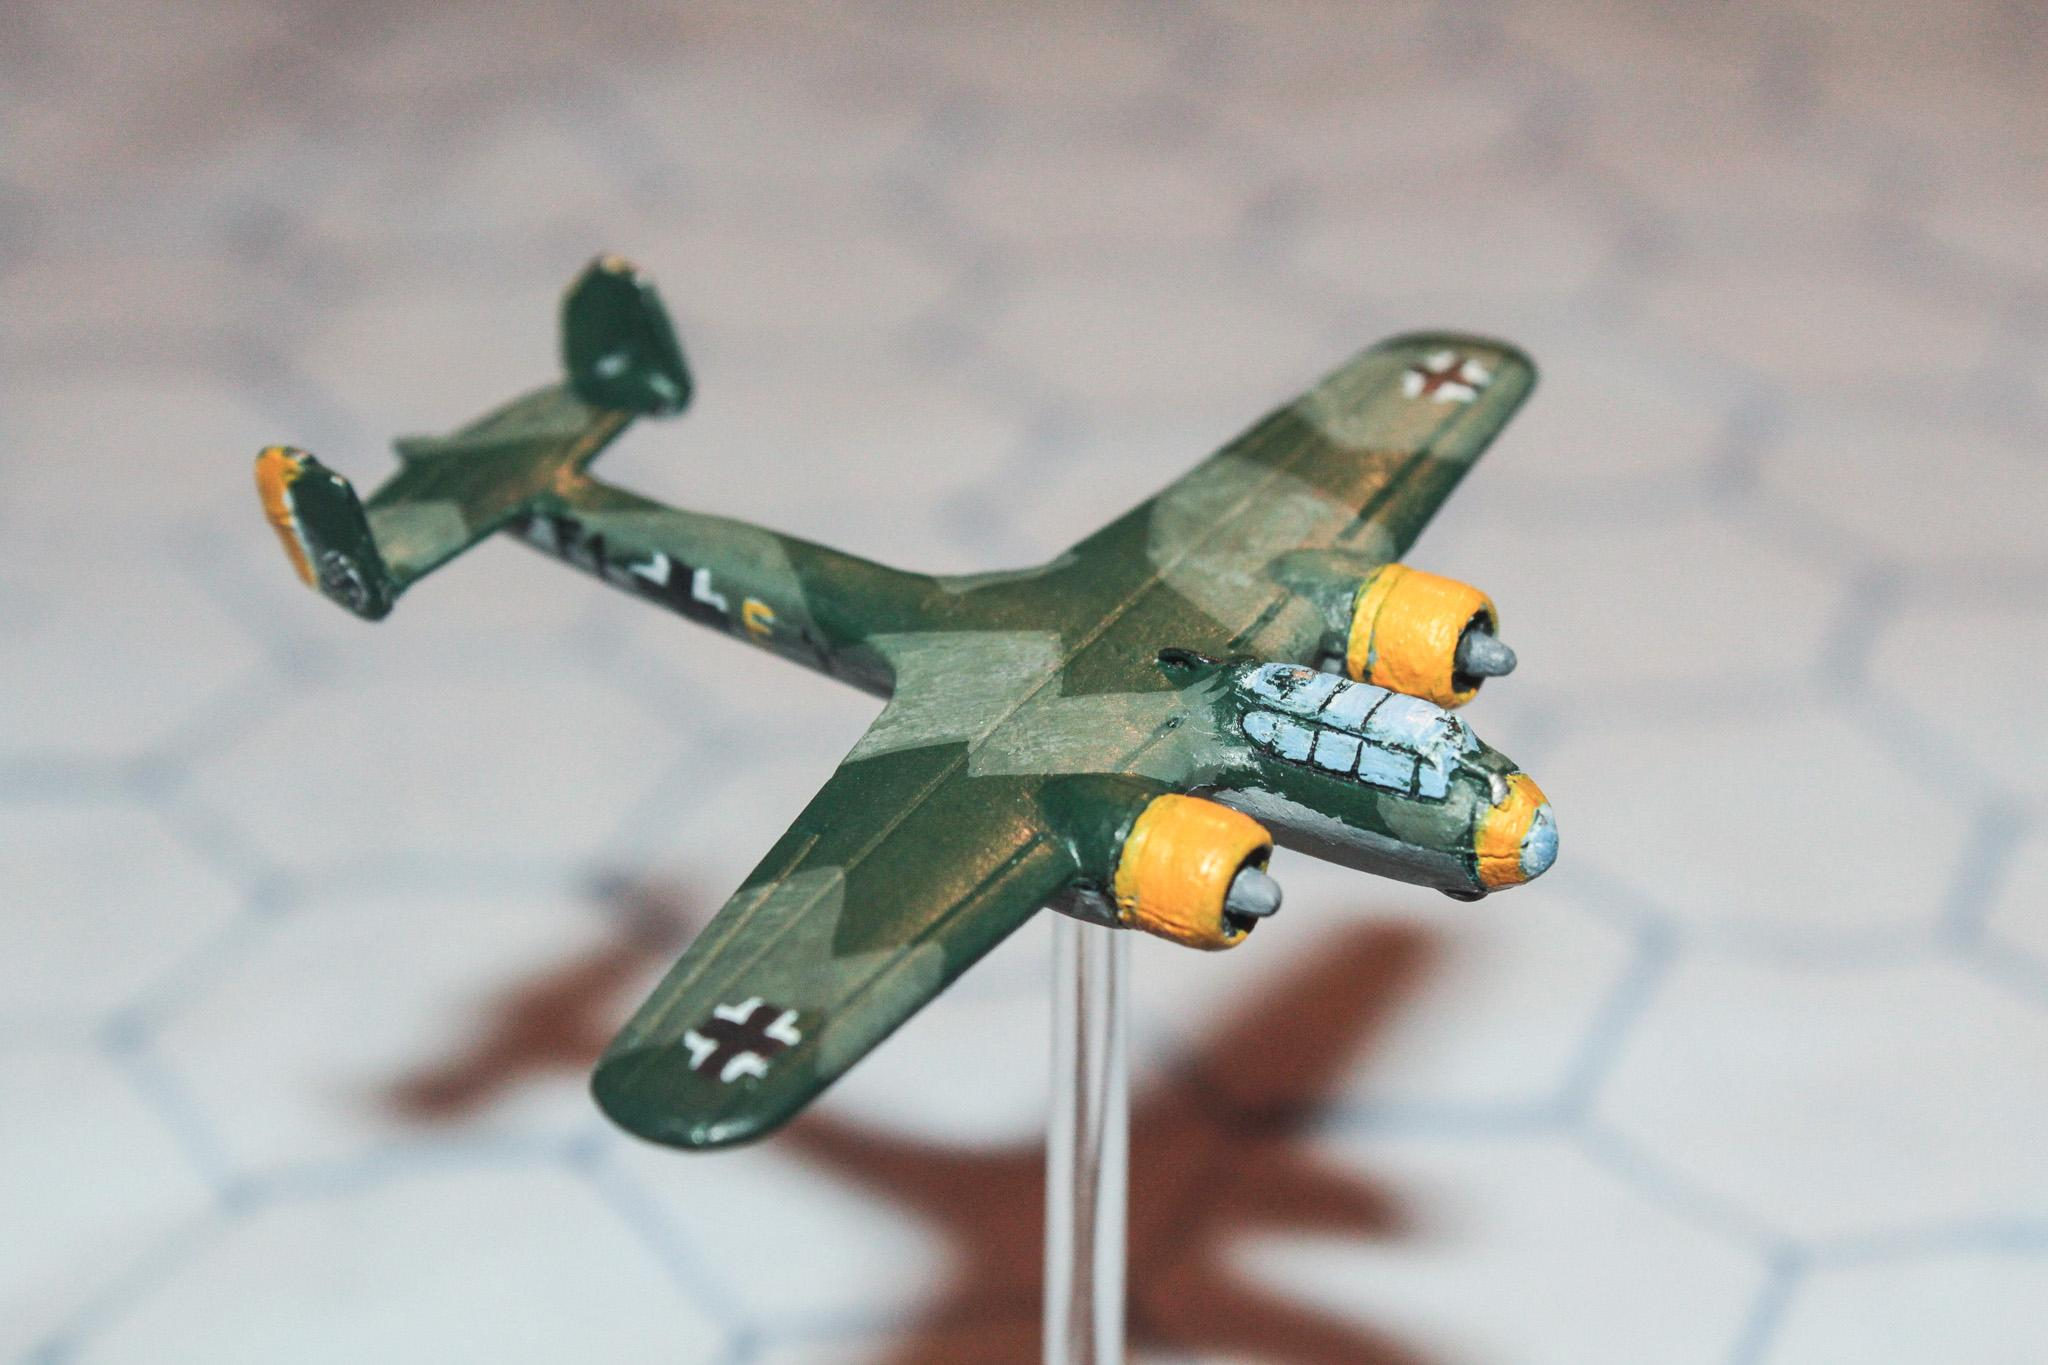 1:300, 6mm, Air Combat, Airborne, Aircraft, Airplane, Aviation, Check Your 6!, Fliers, Luftwaffe, Planes, World War 2